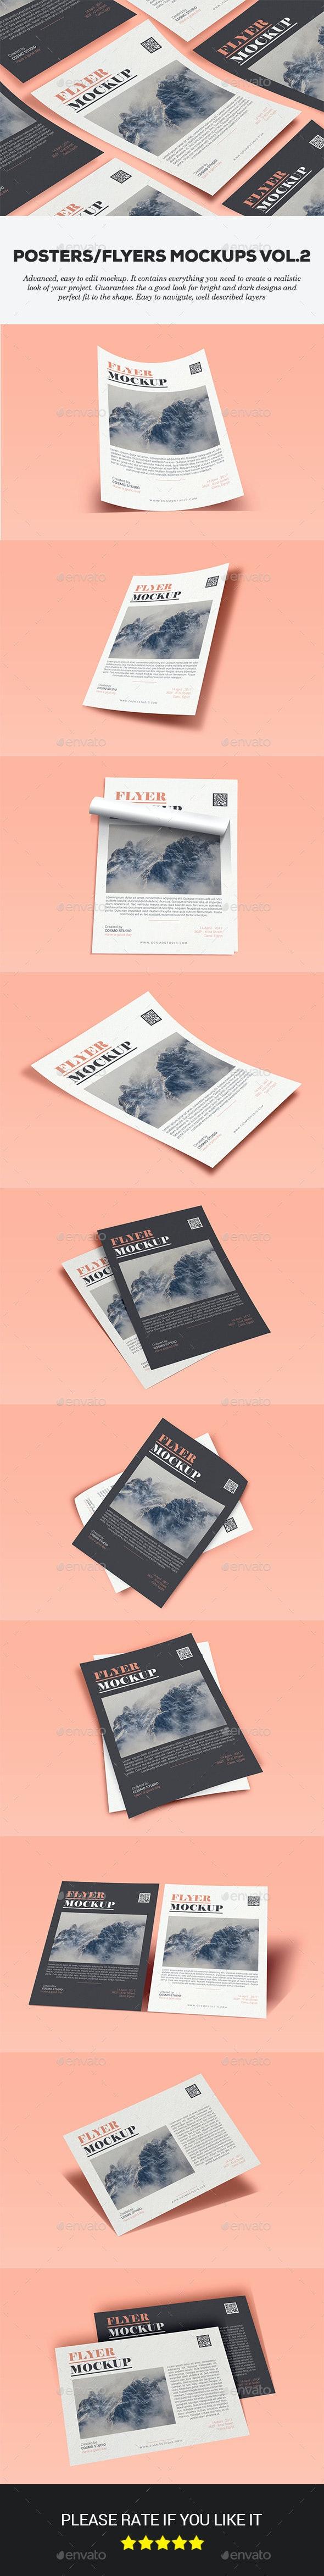 Posters & Flyers Mockups Vol.2 - Flyers Print